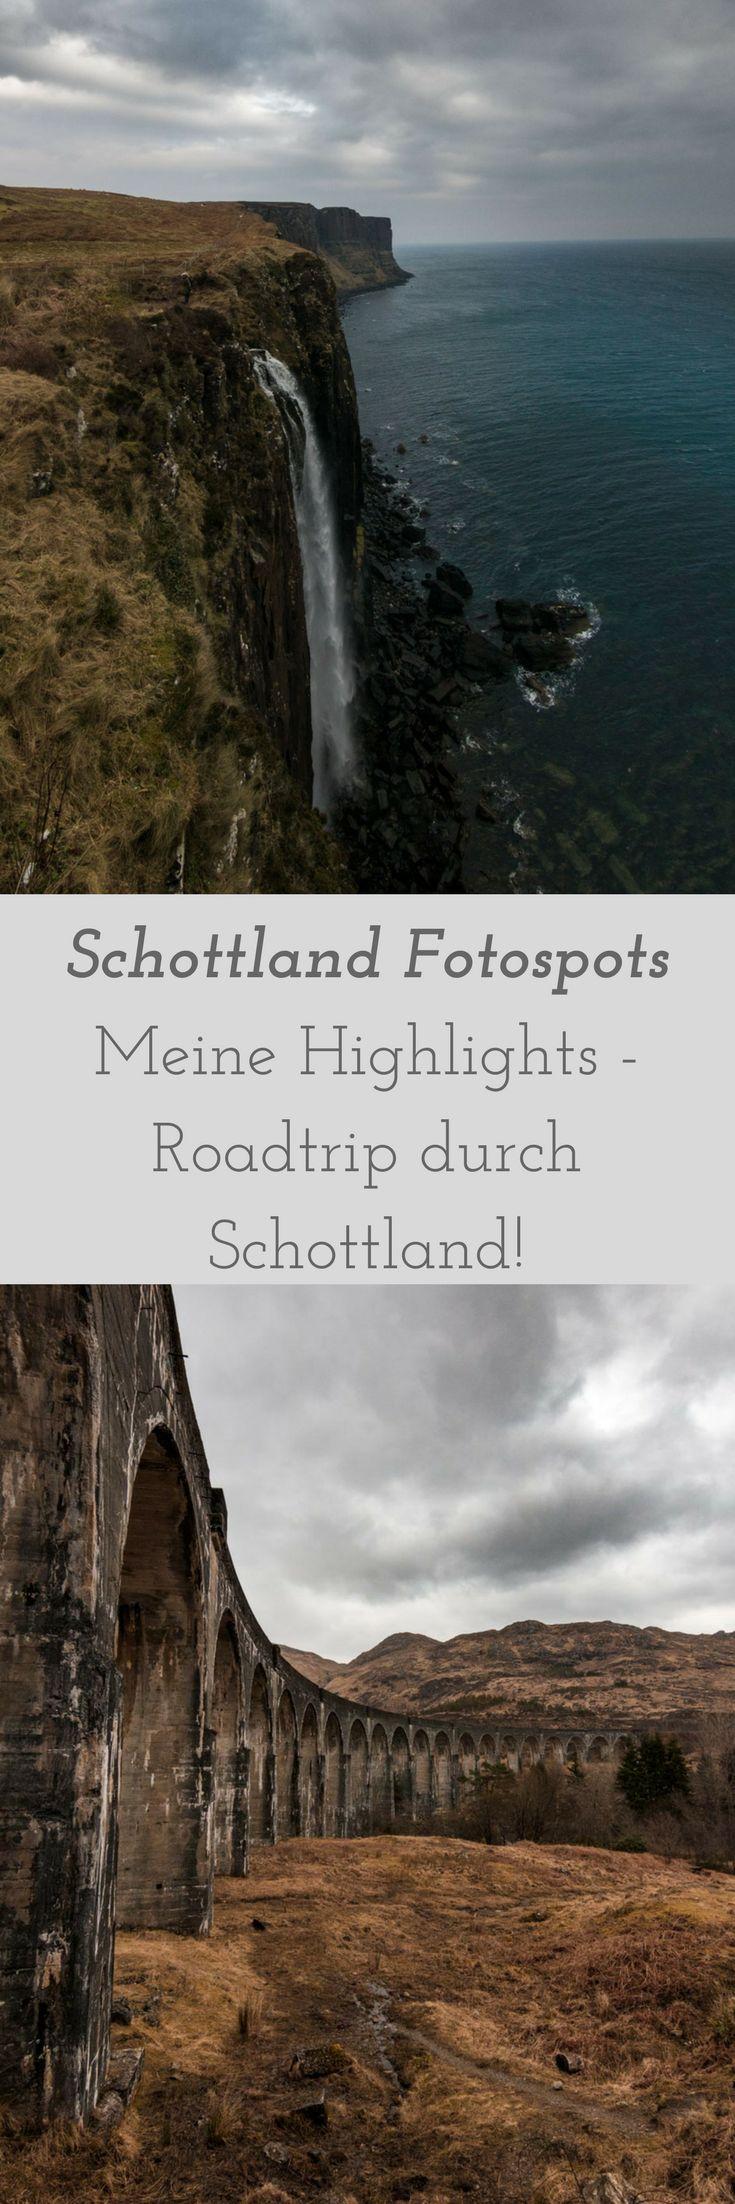 Schottland Fotospots – Roadtrip Schottland – Imani Harris